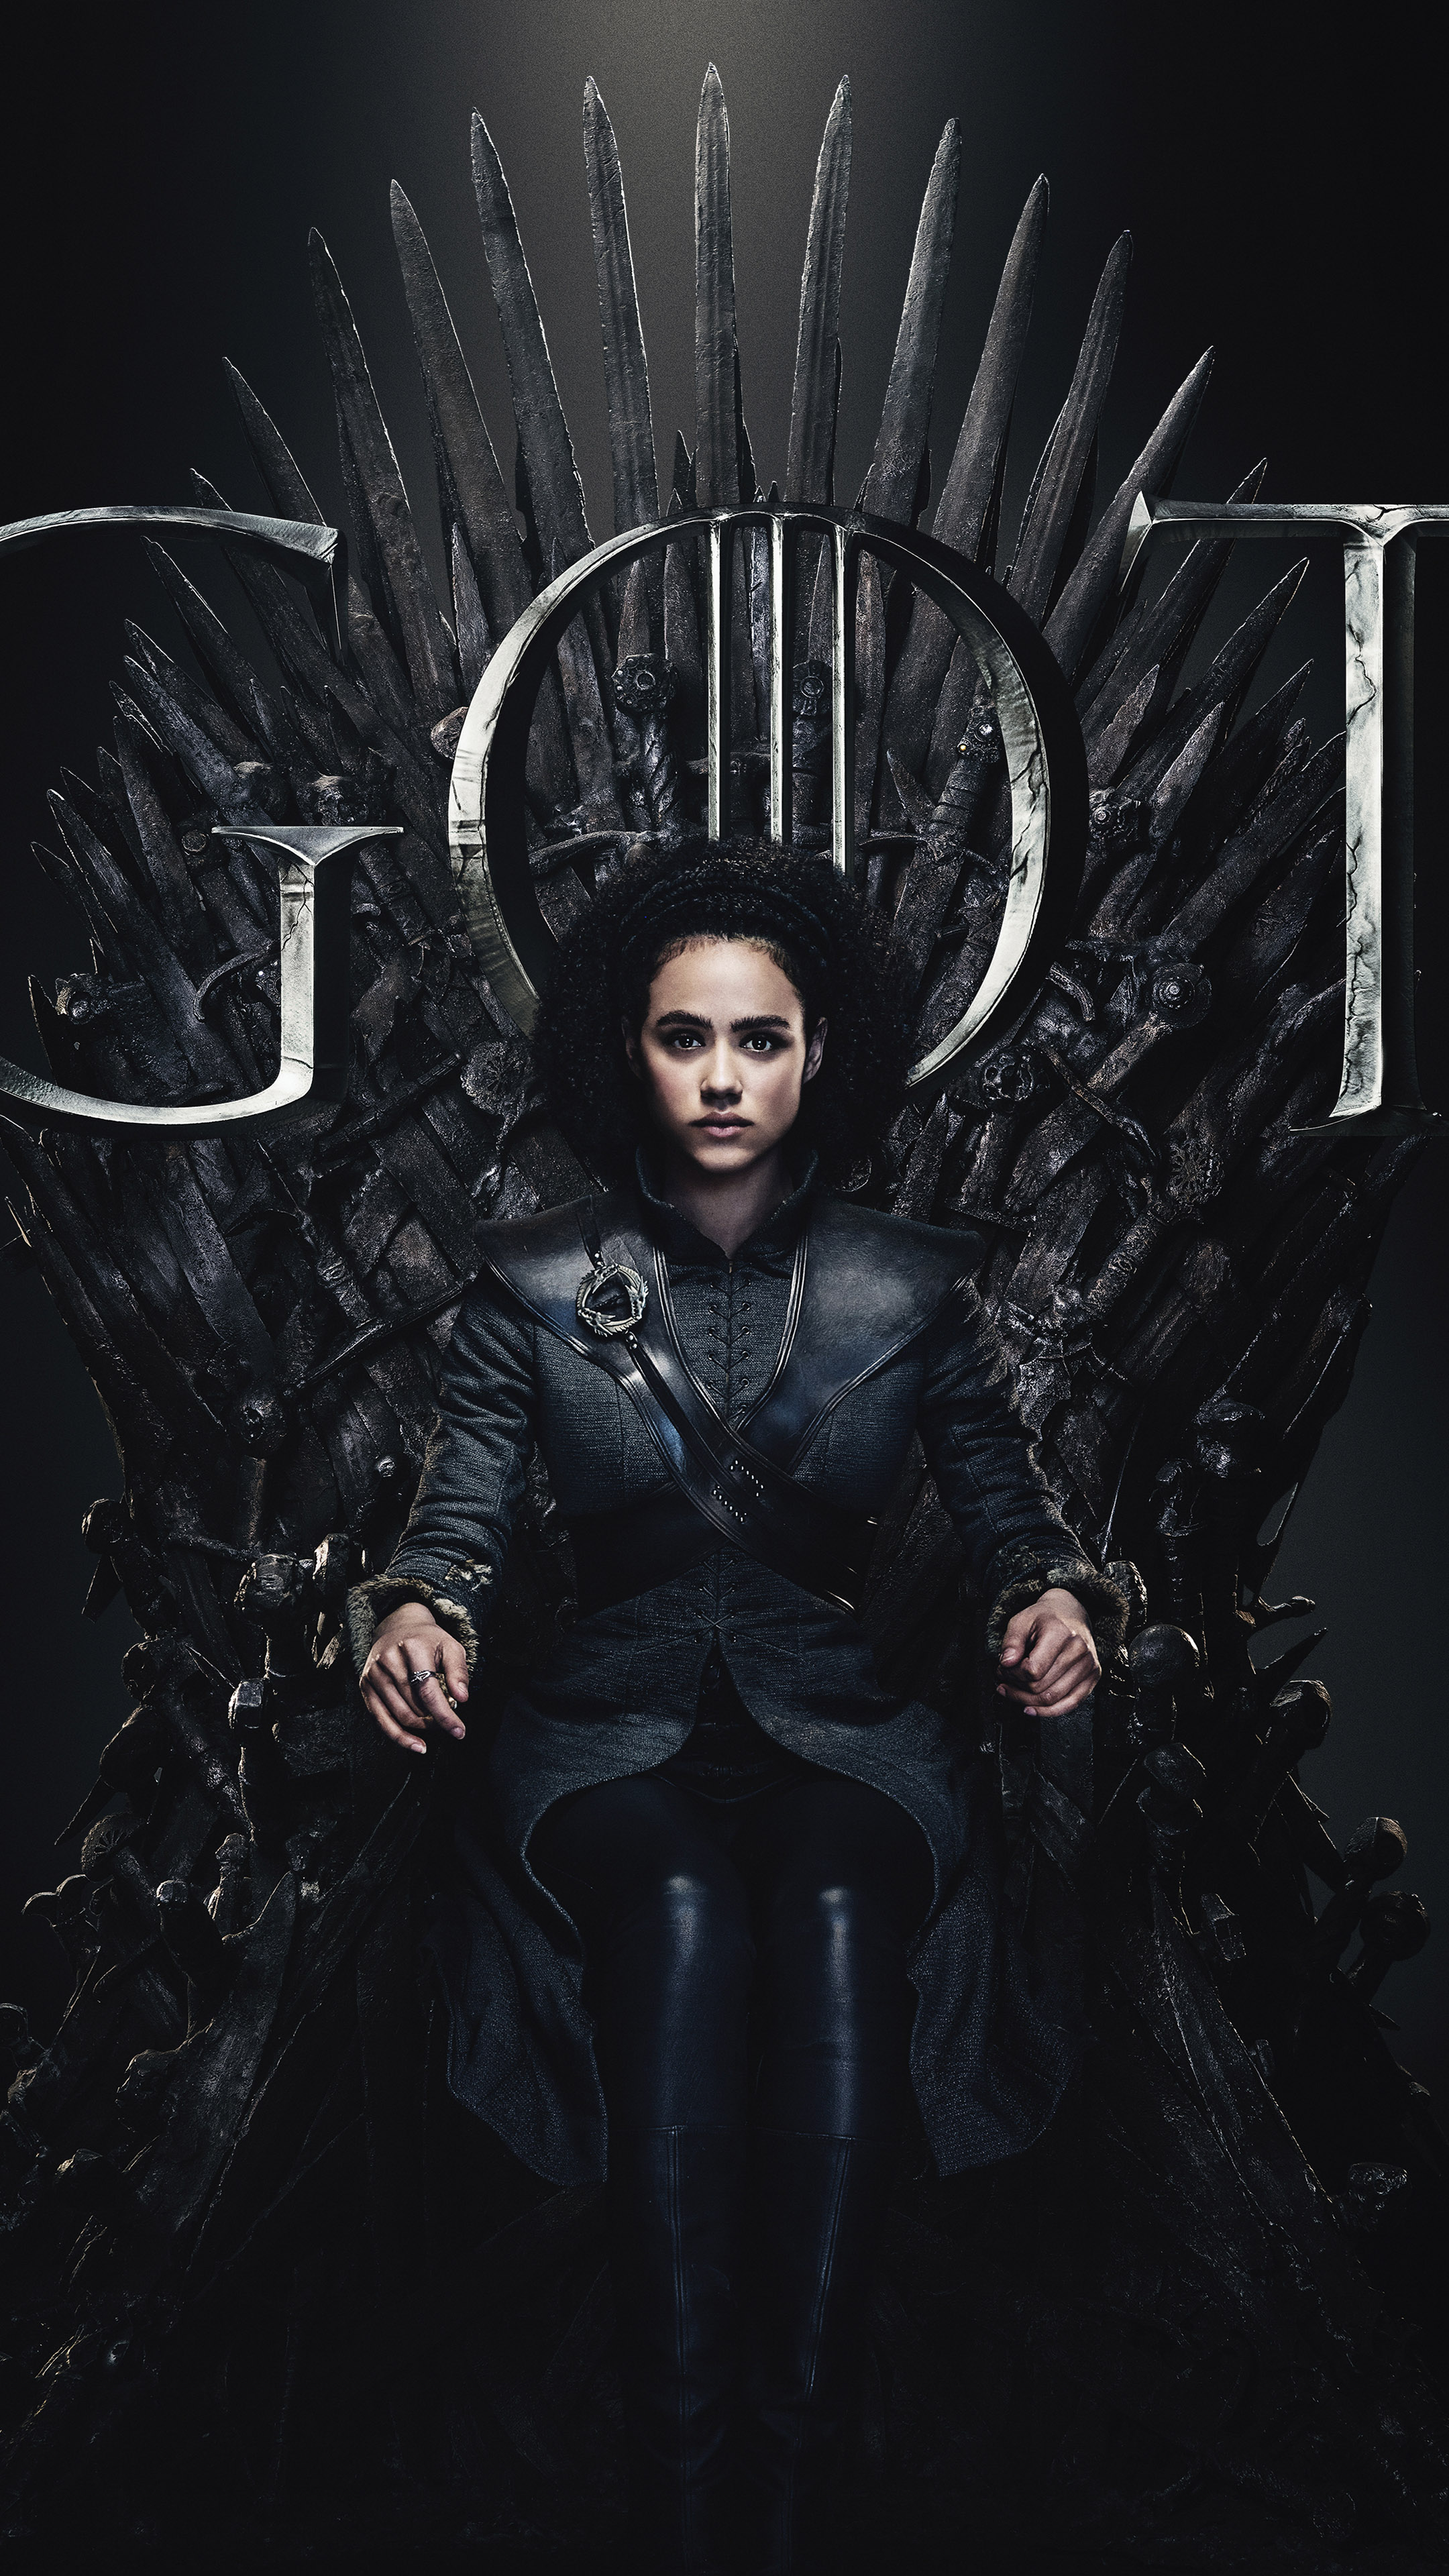 Game Of Thrones Saison 8 Episode 3 Vostfr Download : thrones, saison, episode, vostfr, download, Games, Thrones, Saison, Francais, Sortie, Muharram